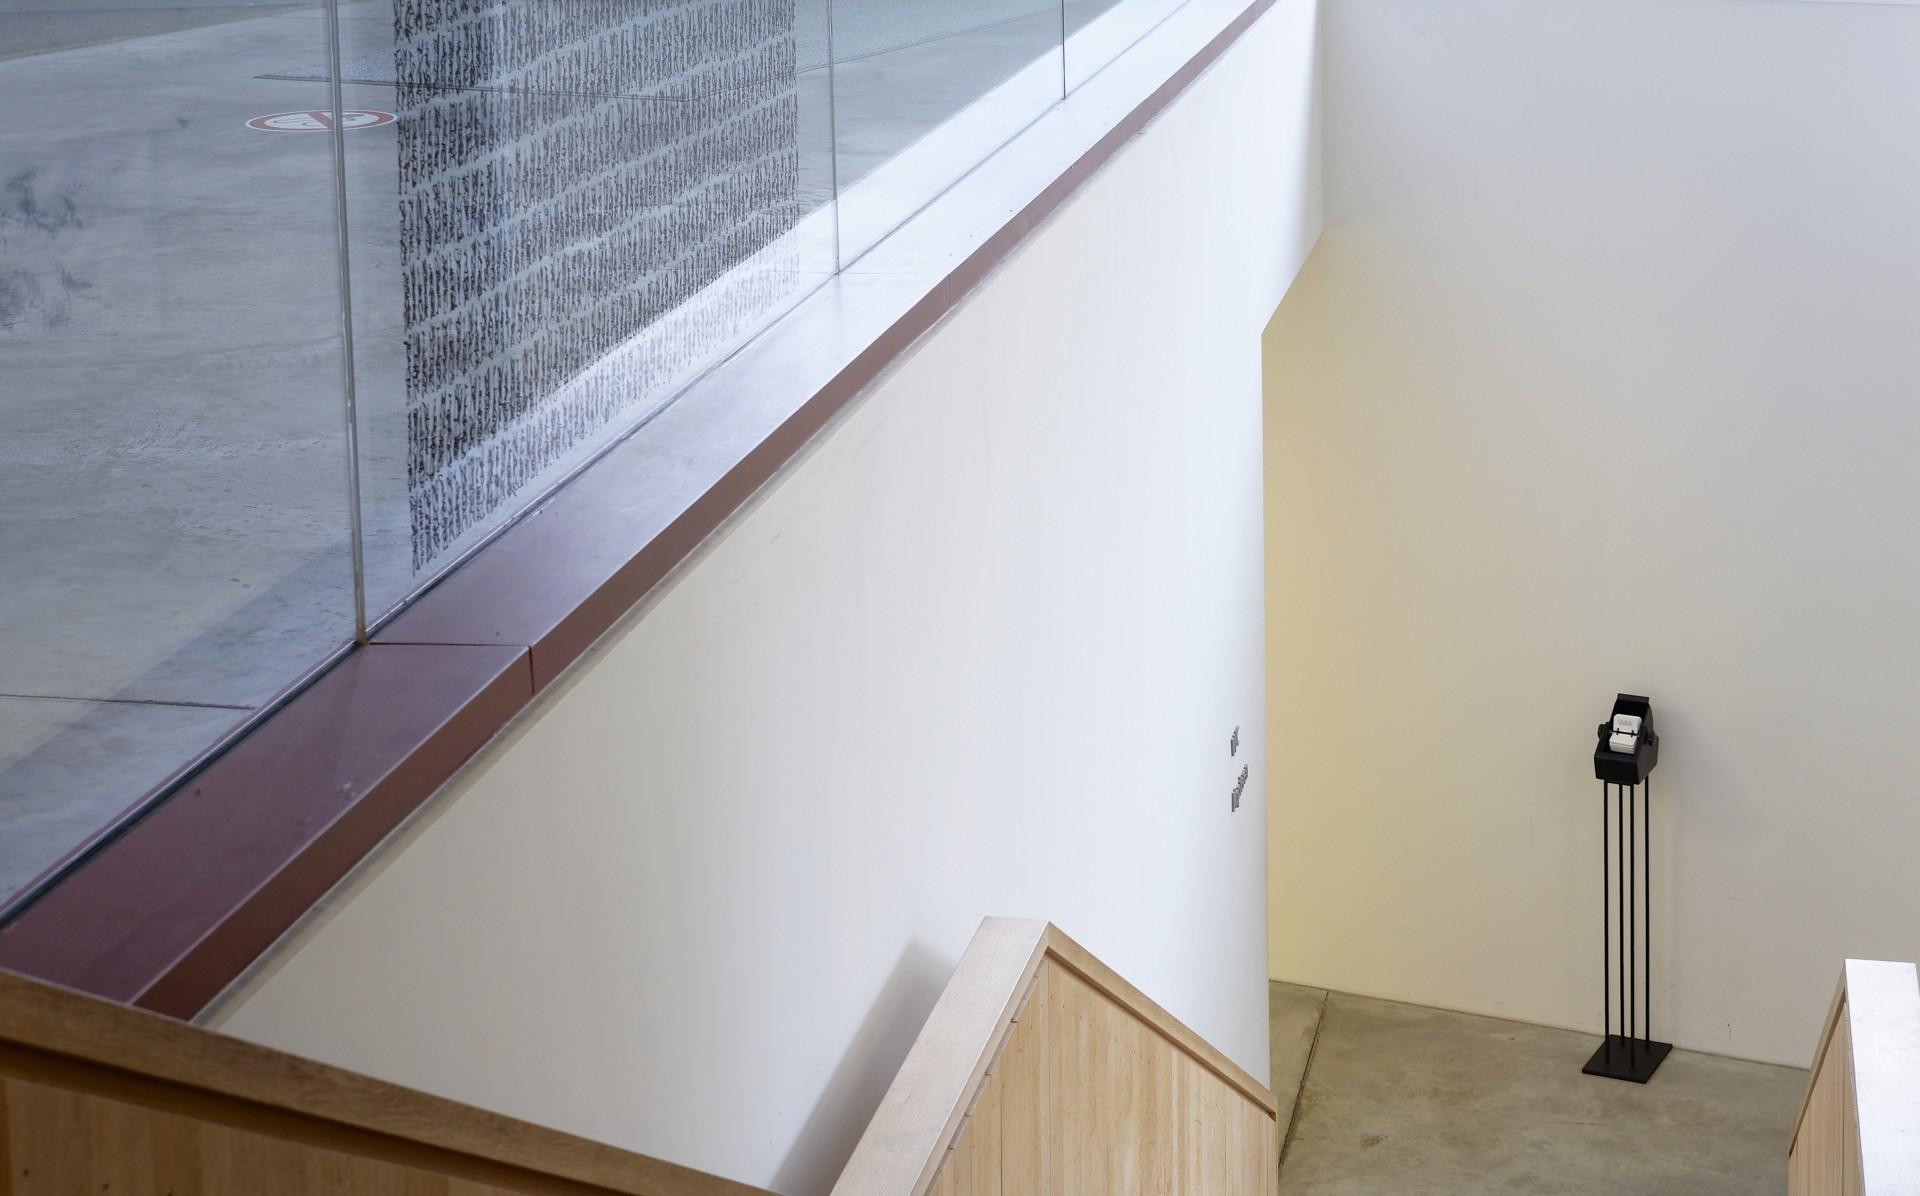 Rotadex, Stahlgehäuse/Eisengestell, 500 Karteikarten 8,9 x 5,2 cm,  2017